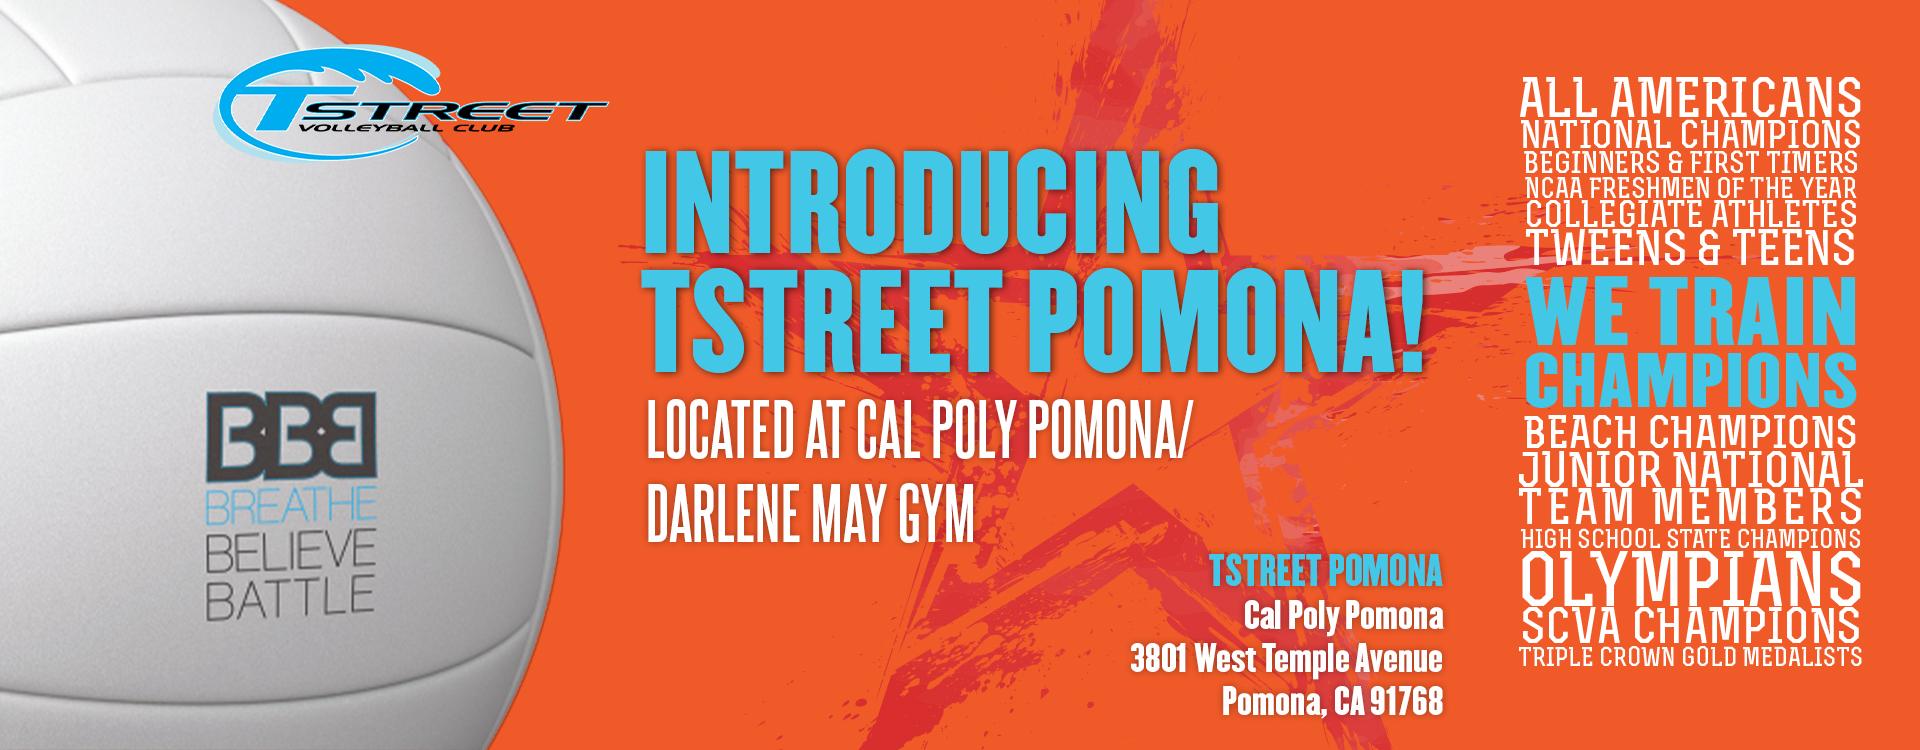 Introducing Tstreet Pomona!